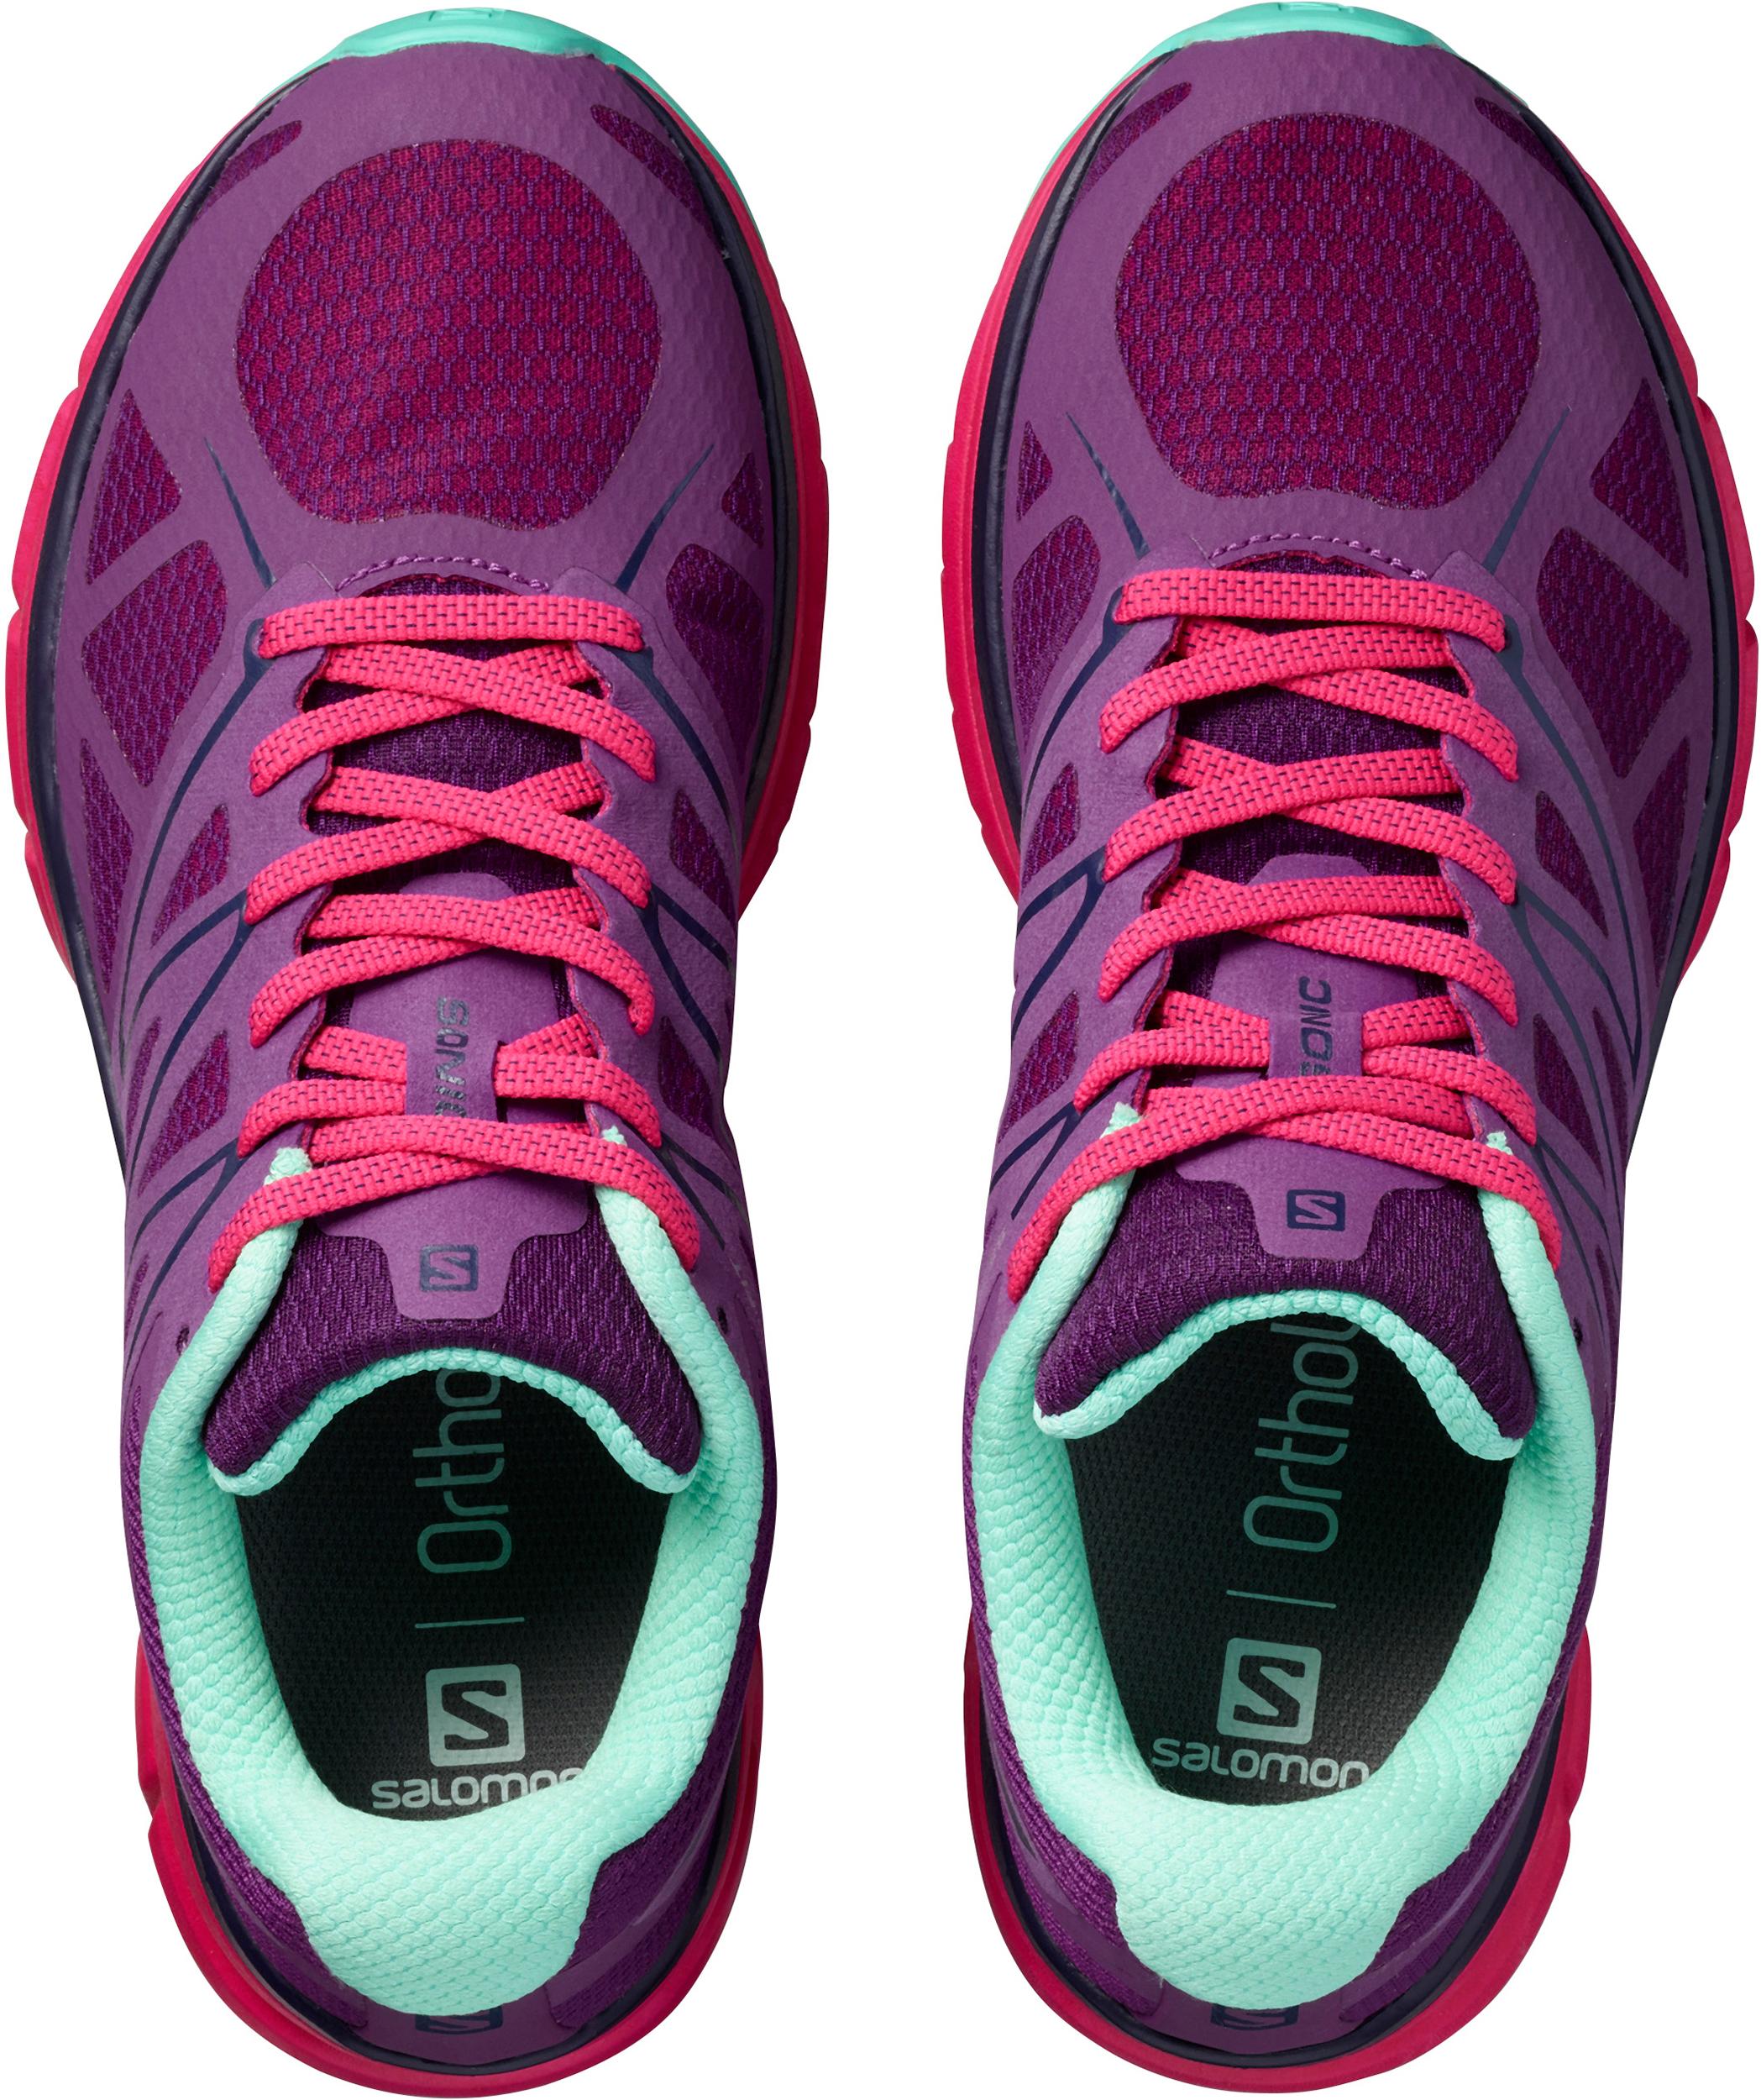 0805898aa7bb Salomon Sonic Road Running Shoes - Women s